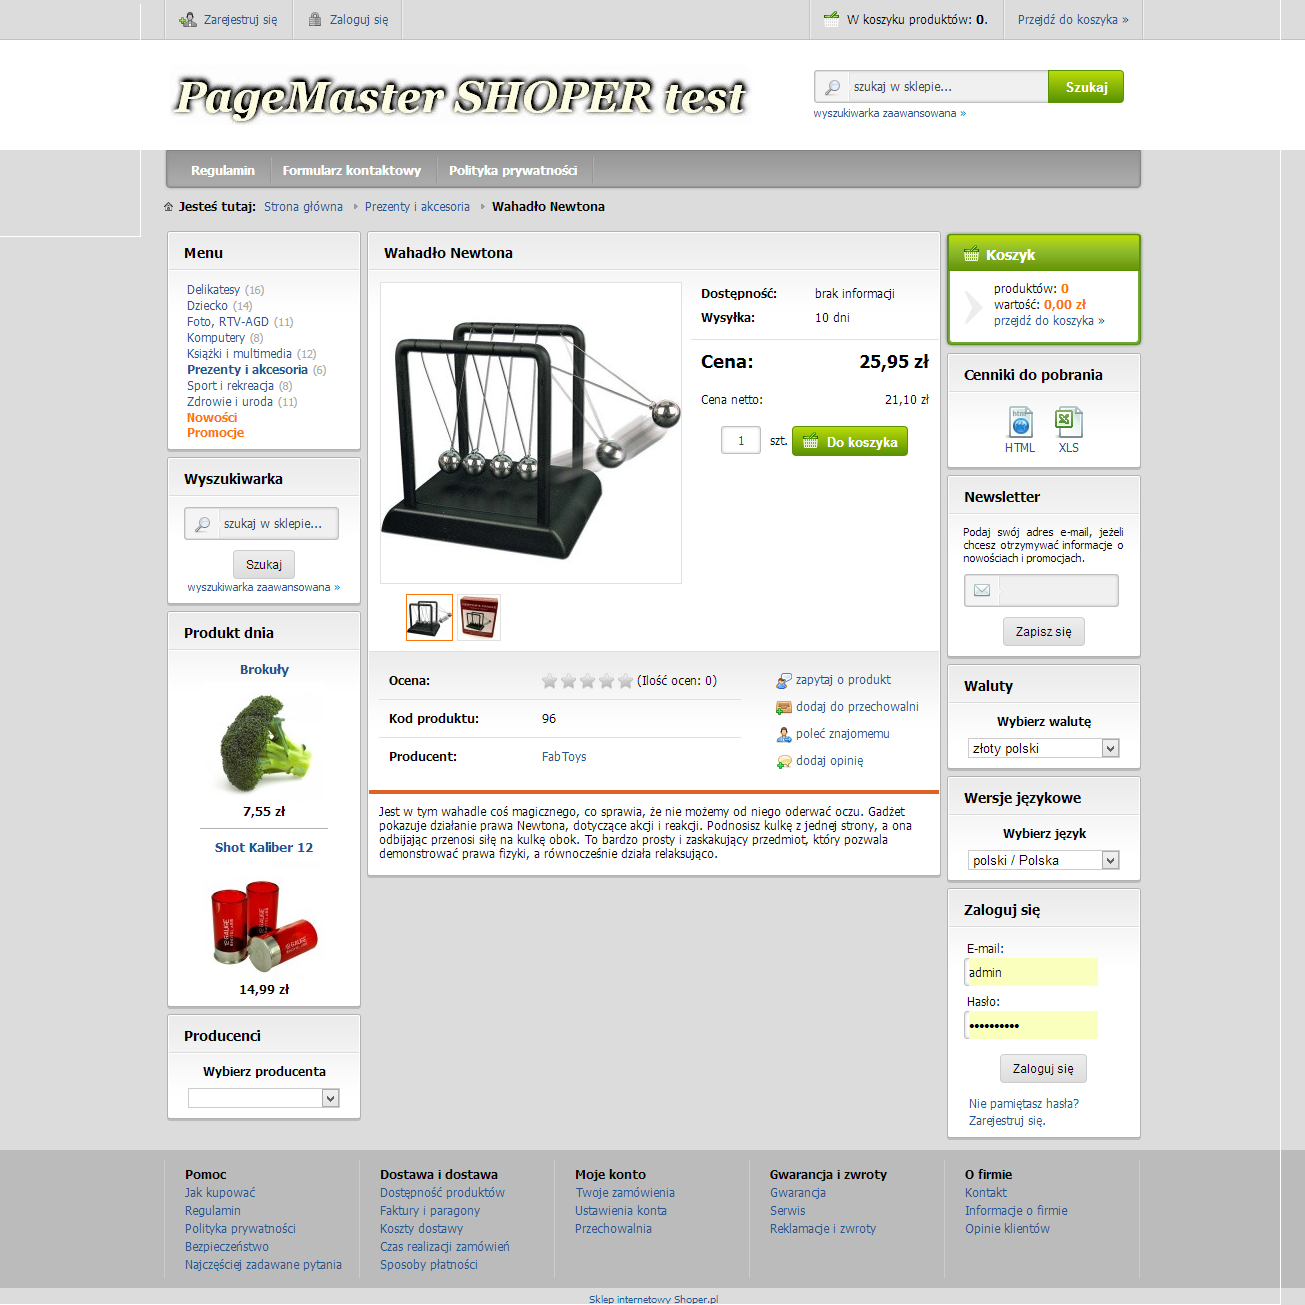 ca28c94be43b89 Sklep Shoper pakiet Srebrny - Page Master